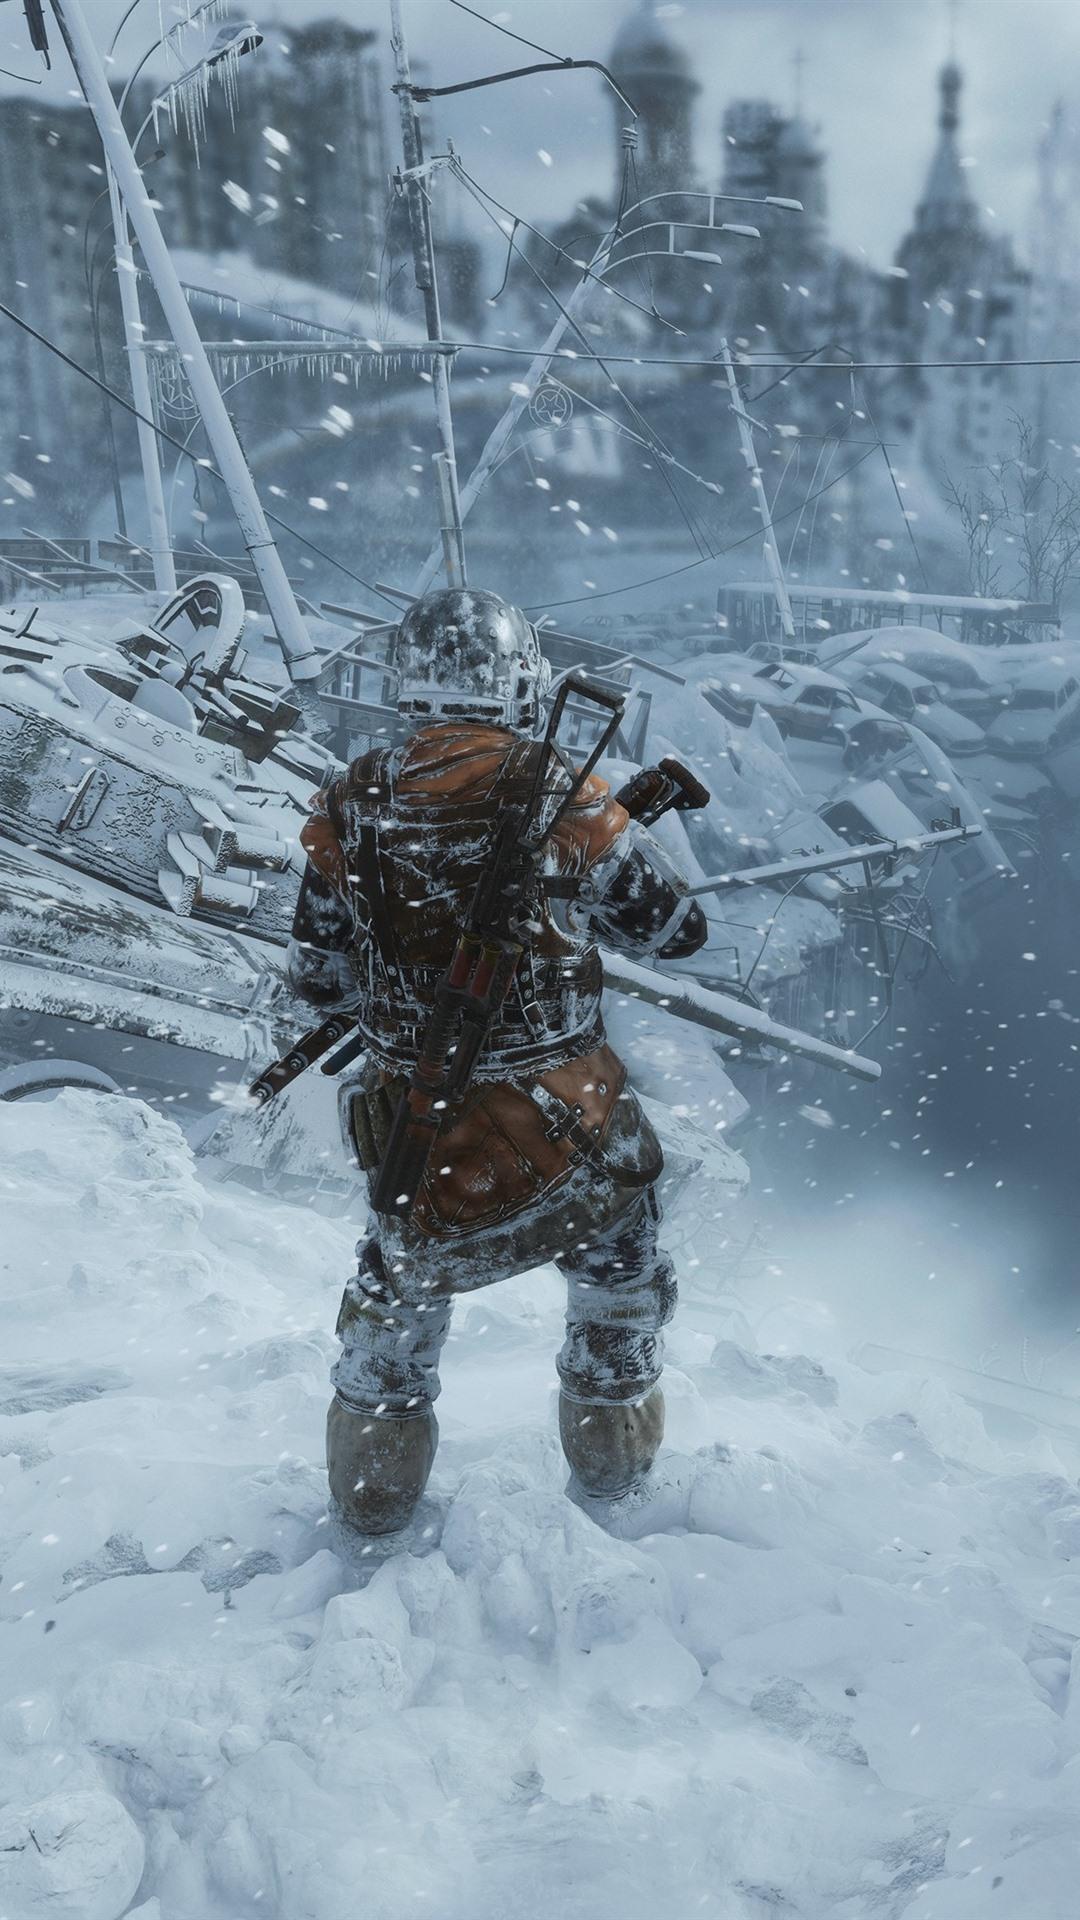 Metro Exodus City Ruins Soldier Winter 1080x1920 Iphone